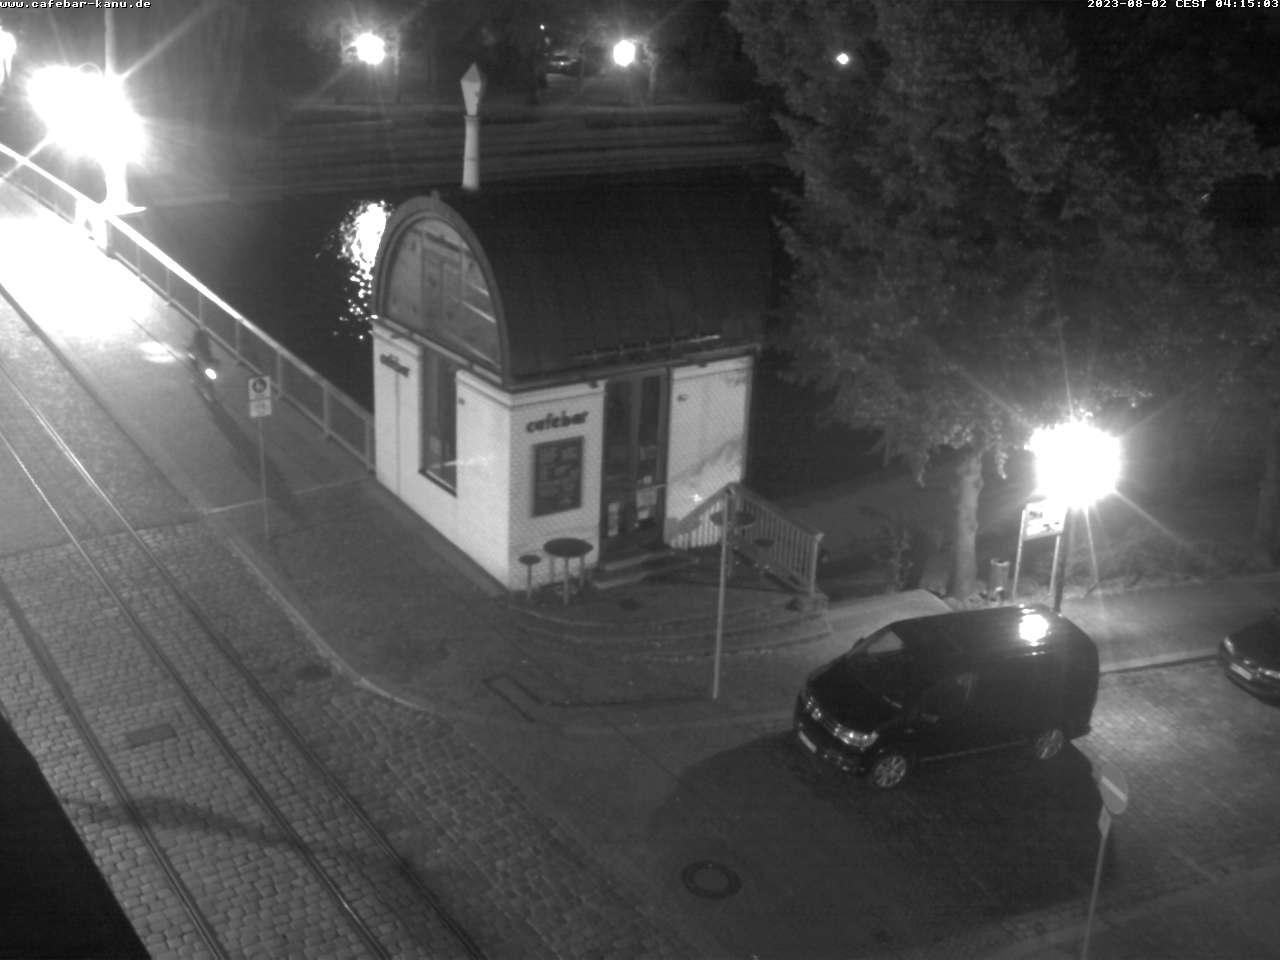 WebcamCafébar mit Blick zur Havel